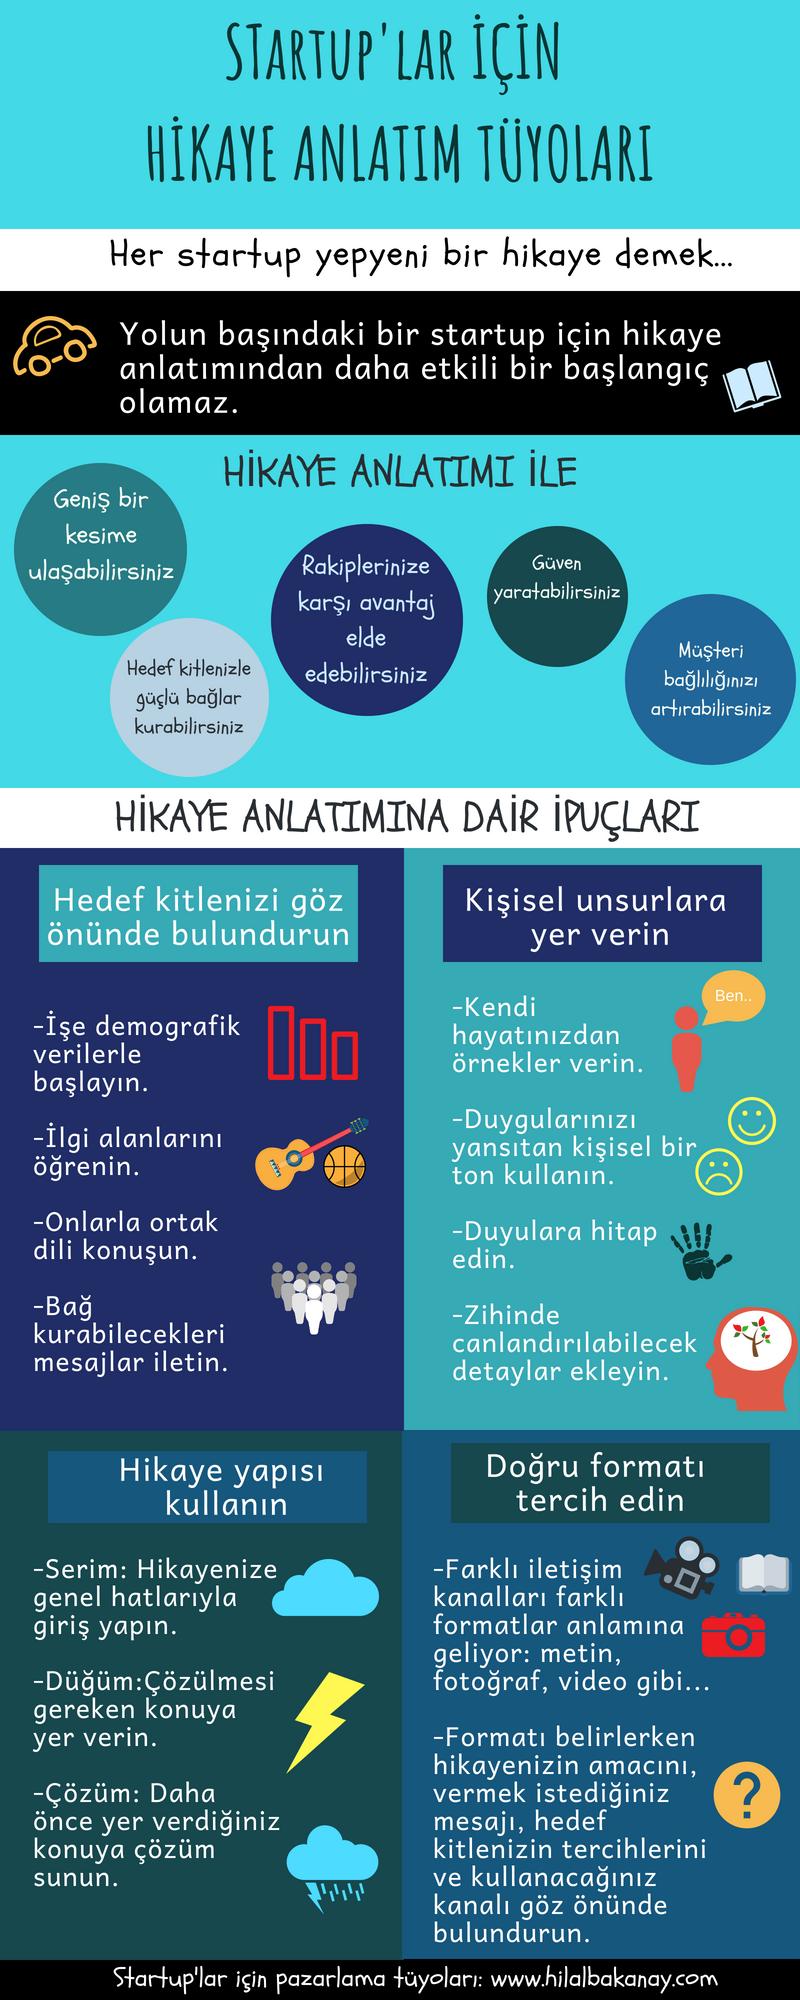 startuplar_icin_hikaye_anlatim_tuyolari